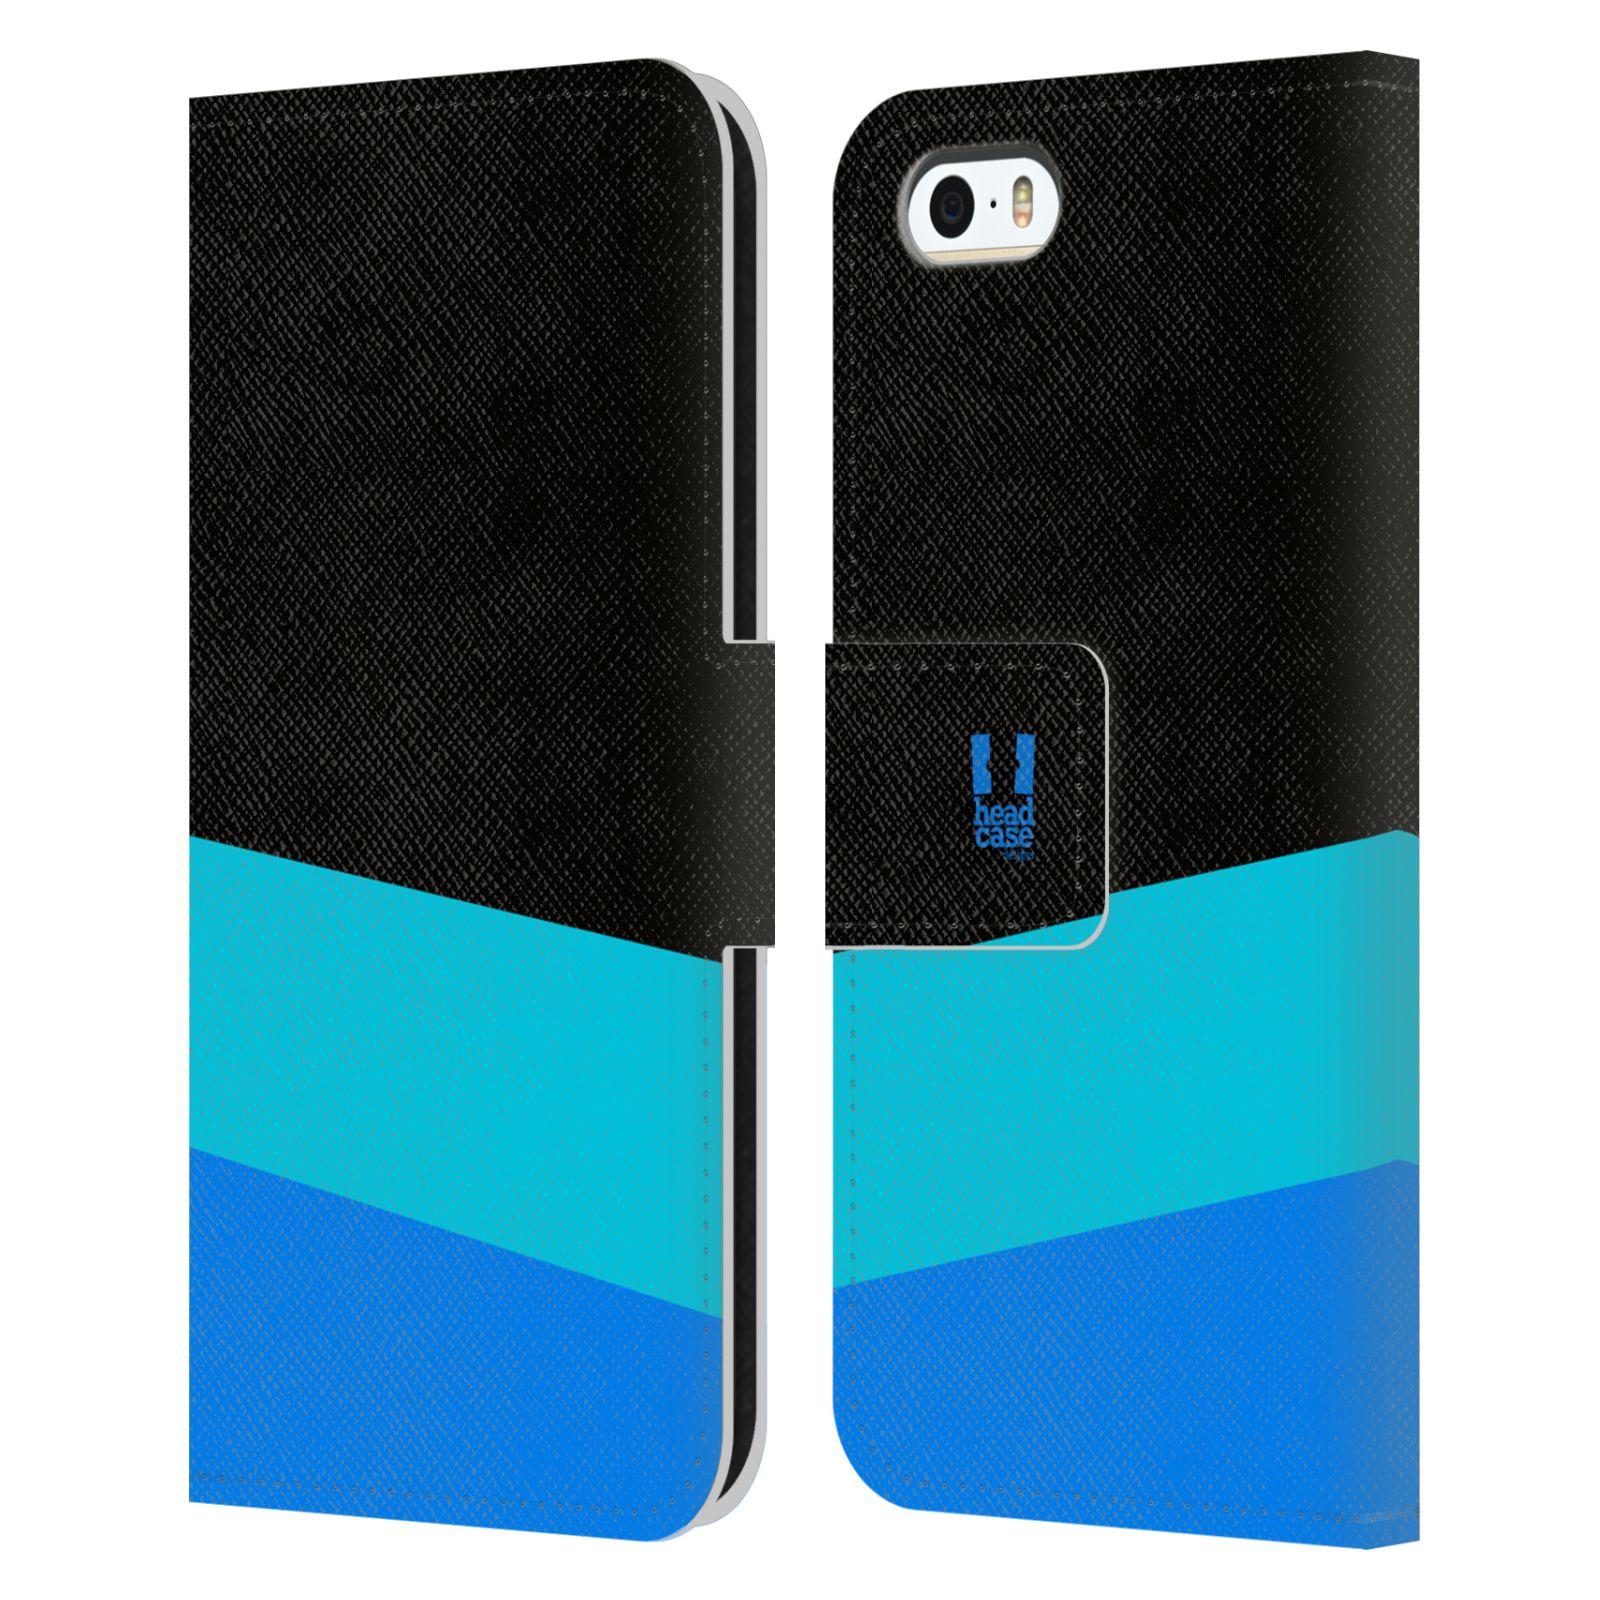 HEAD CASE Flipové pouzdro pro mobil Apple Iphone 5/5S barevné tvary modrá a černá FORMAL